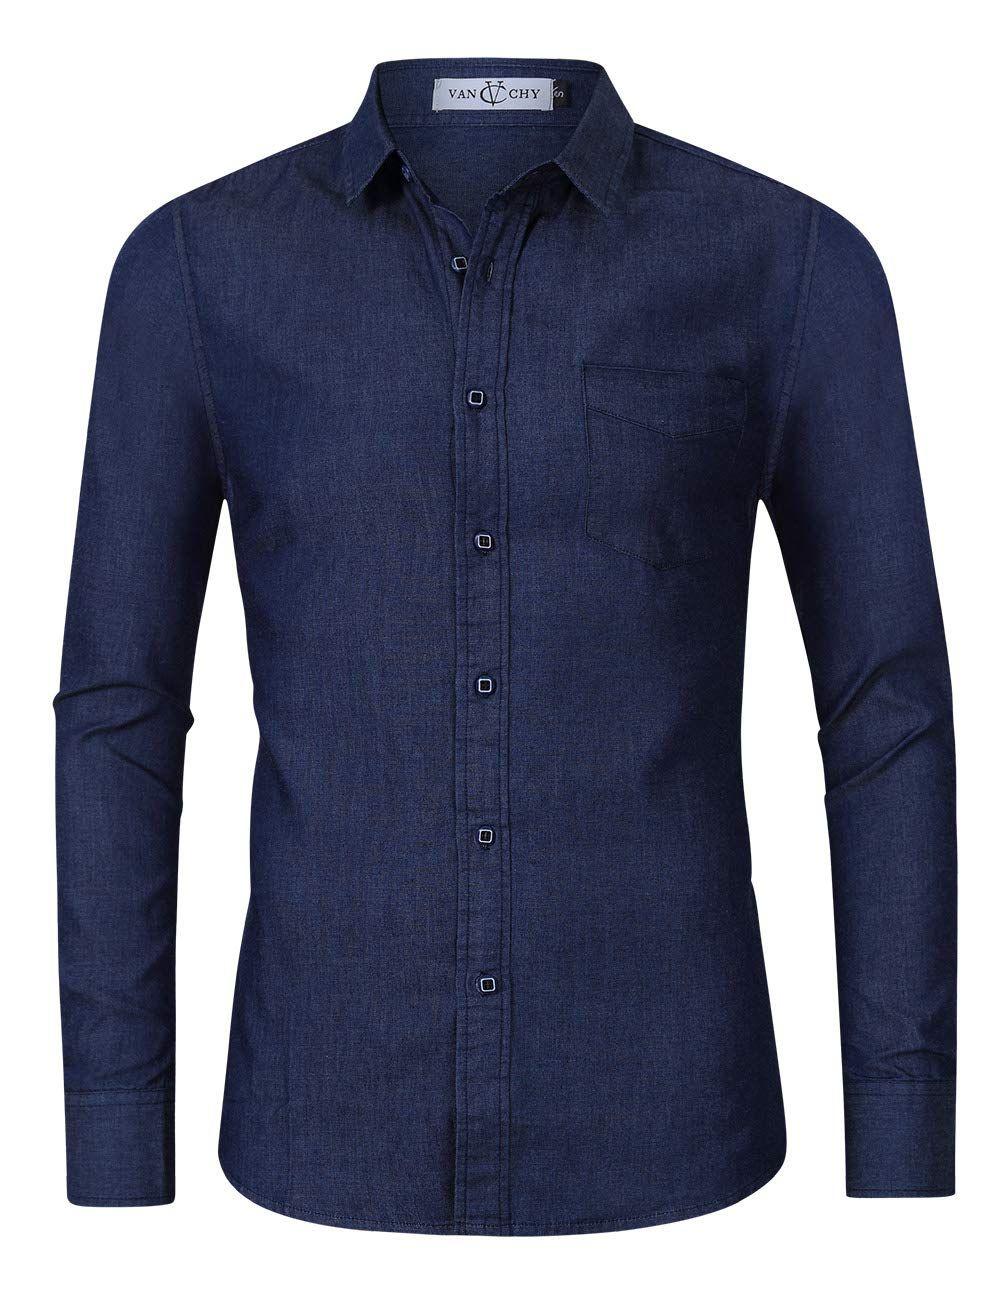 a6770a77b718a VAN CHY Mens Slim Fit Long Sleeve Denim Work Shirt Button Down Dress Shirts  Dark Blue